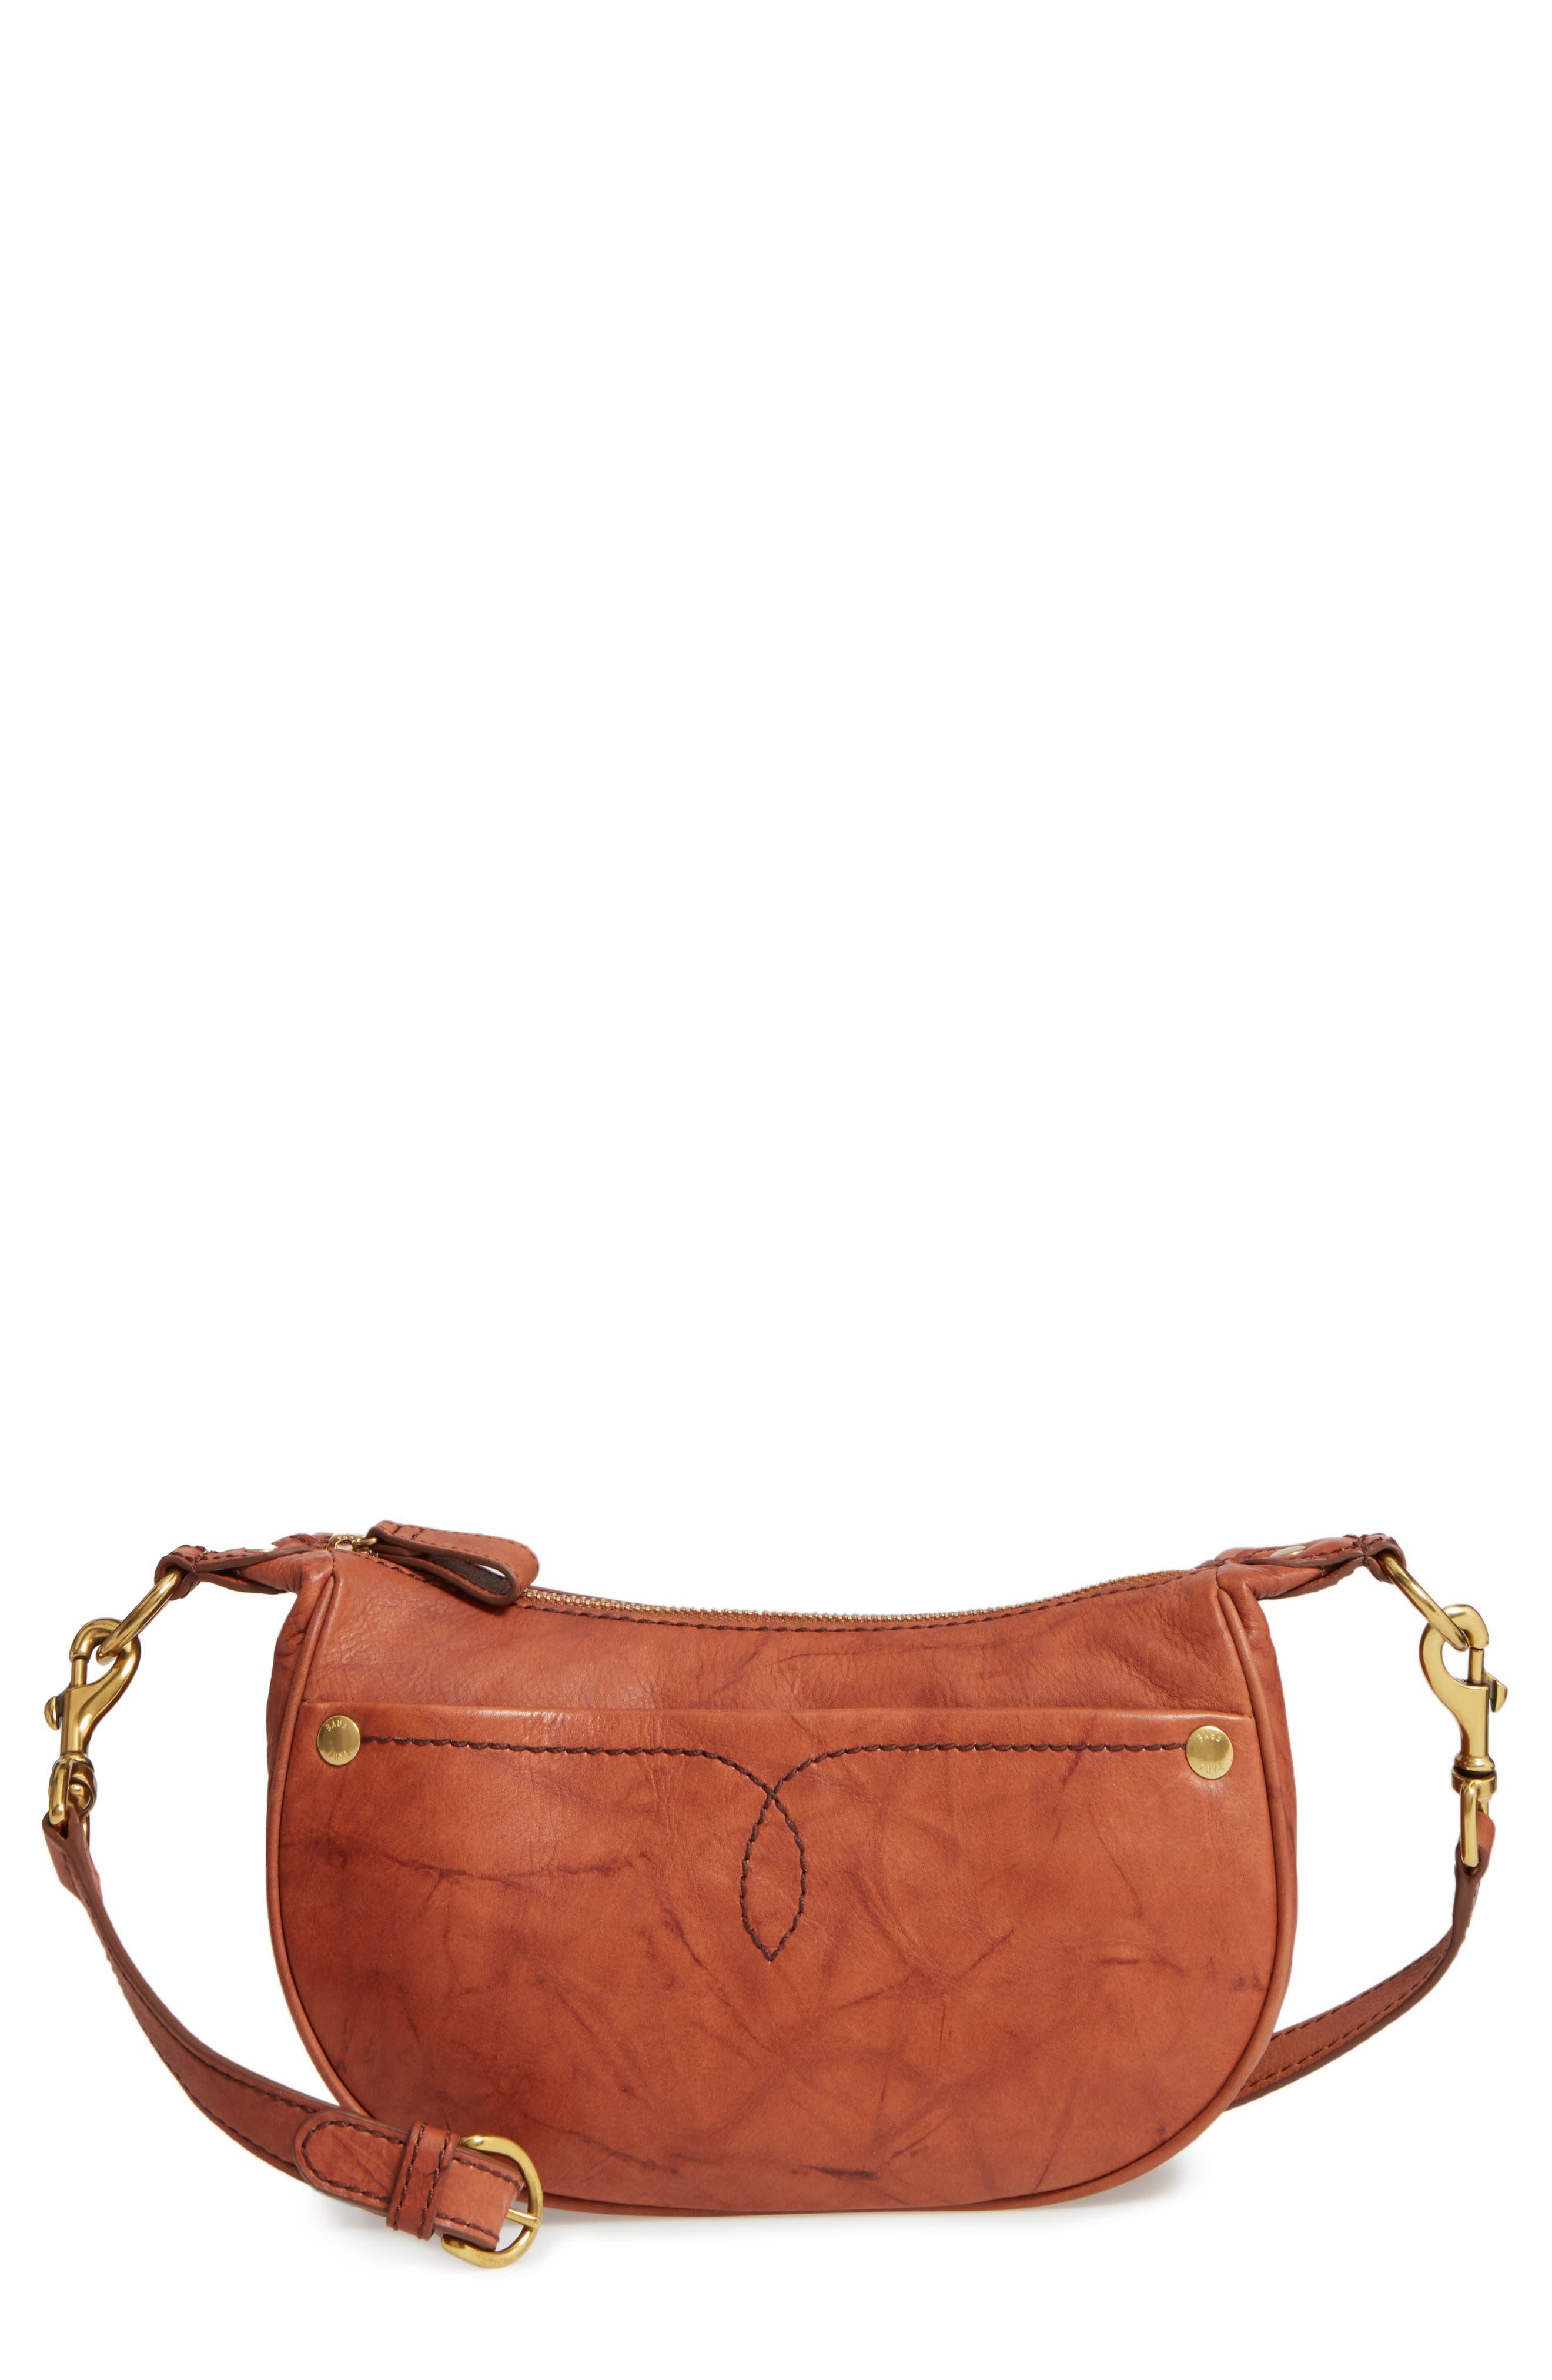 Frye Small Campus Leather Crossbody Bag